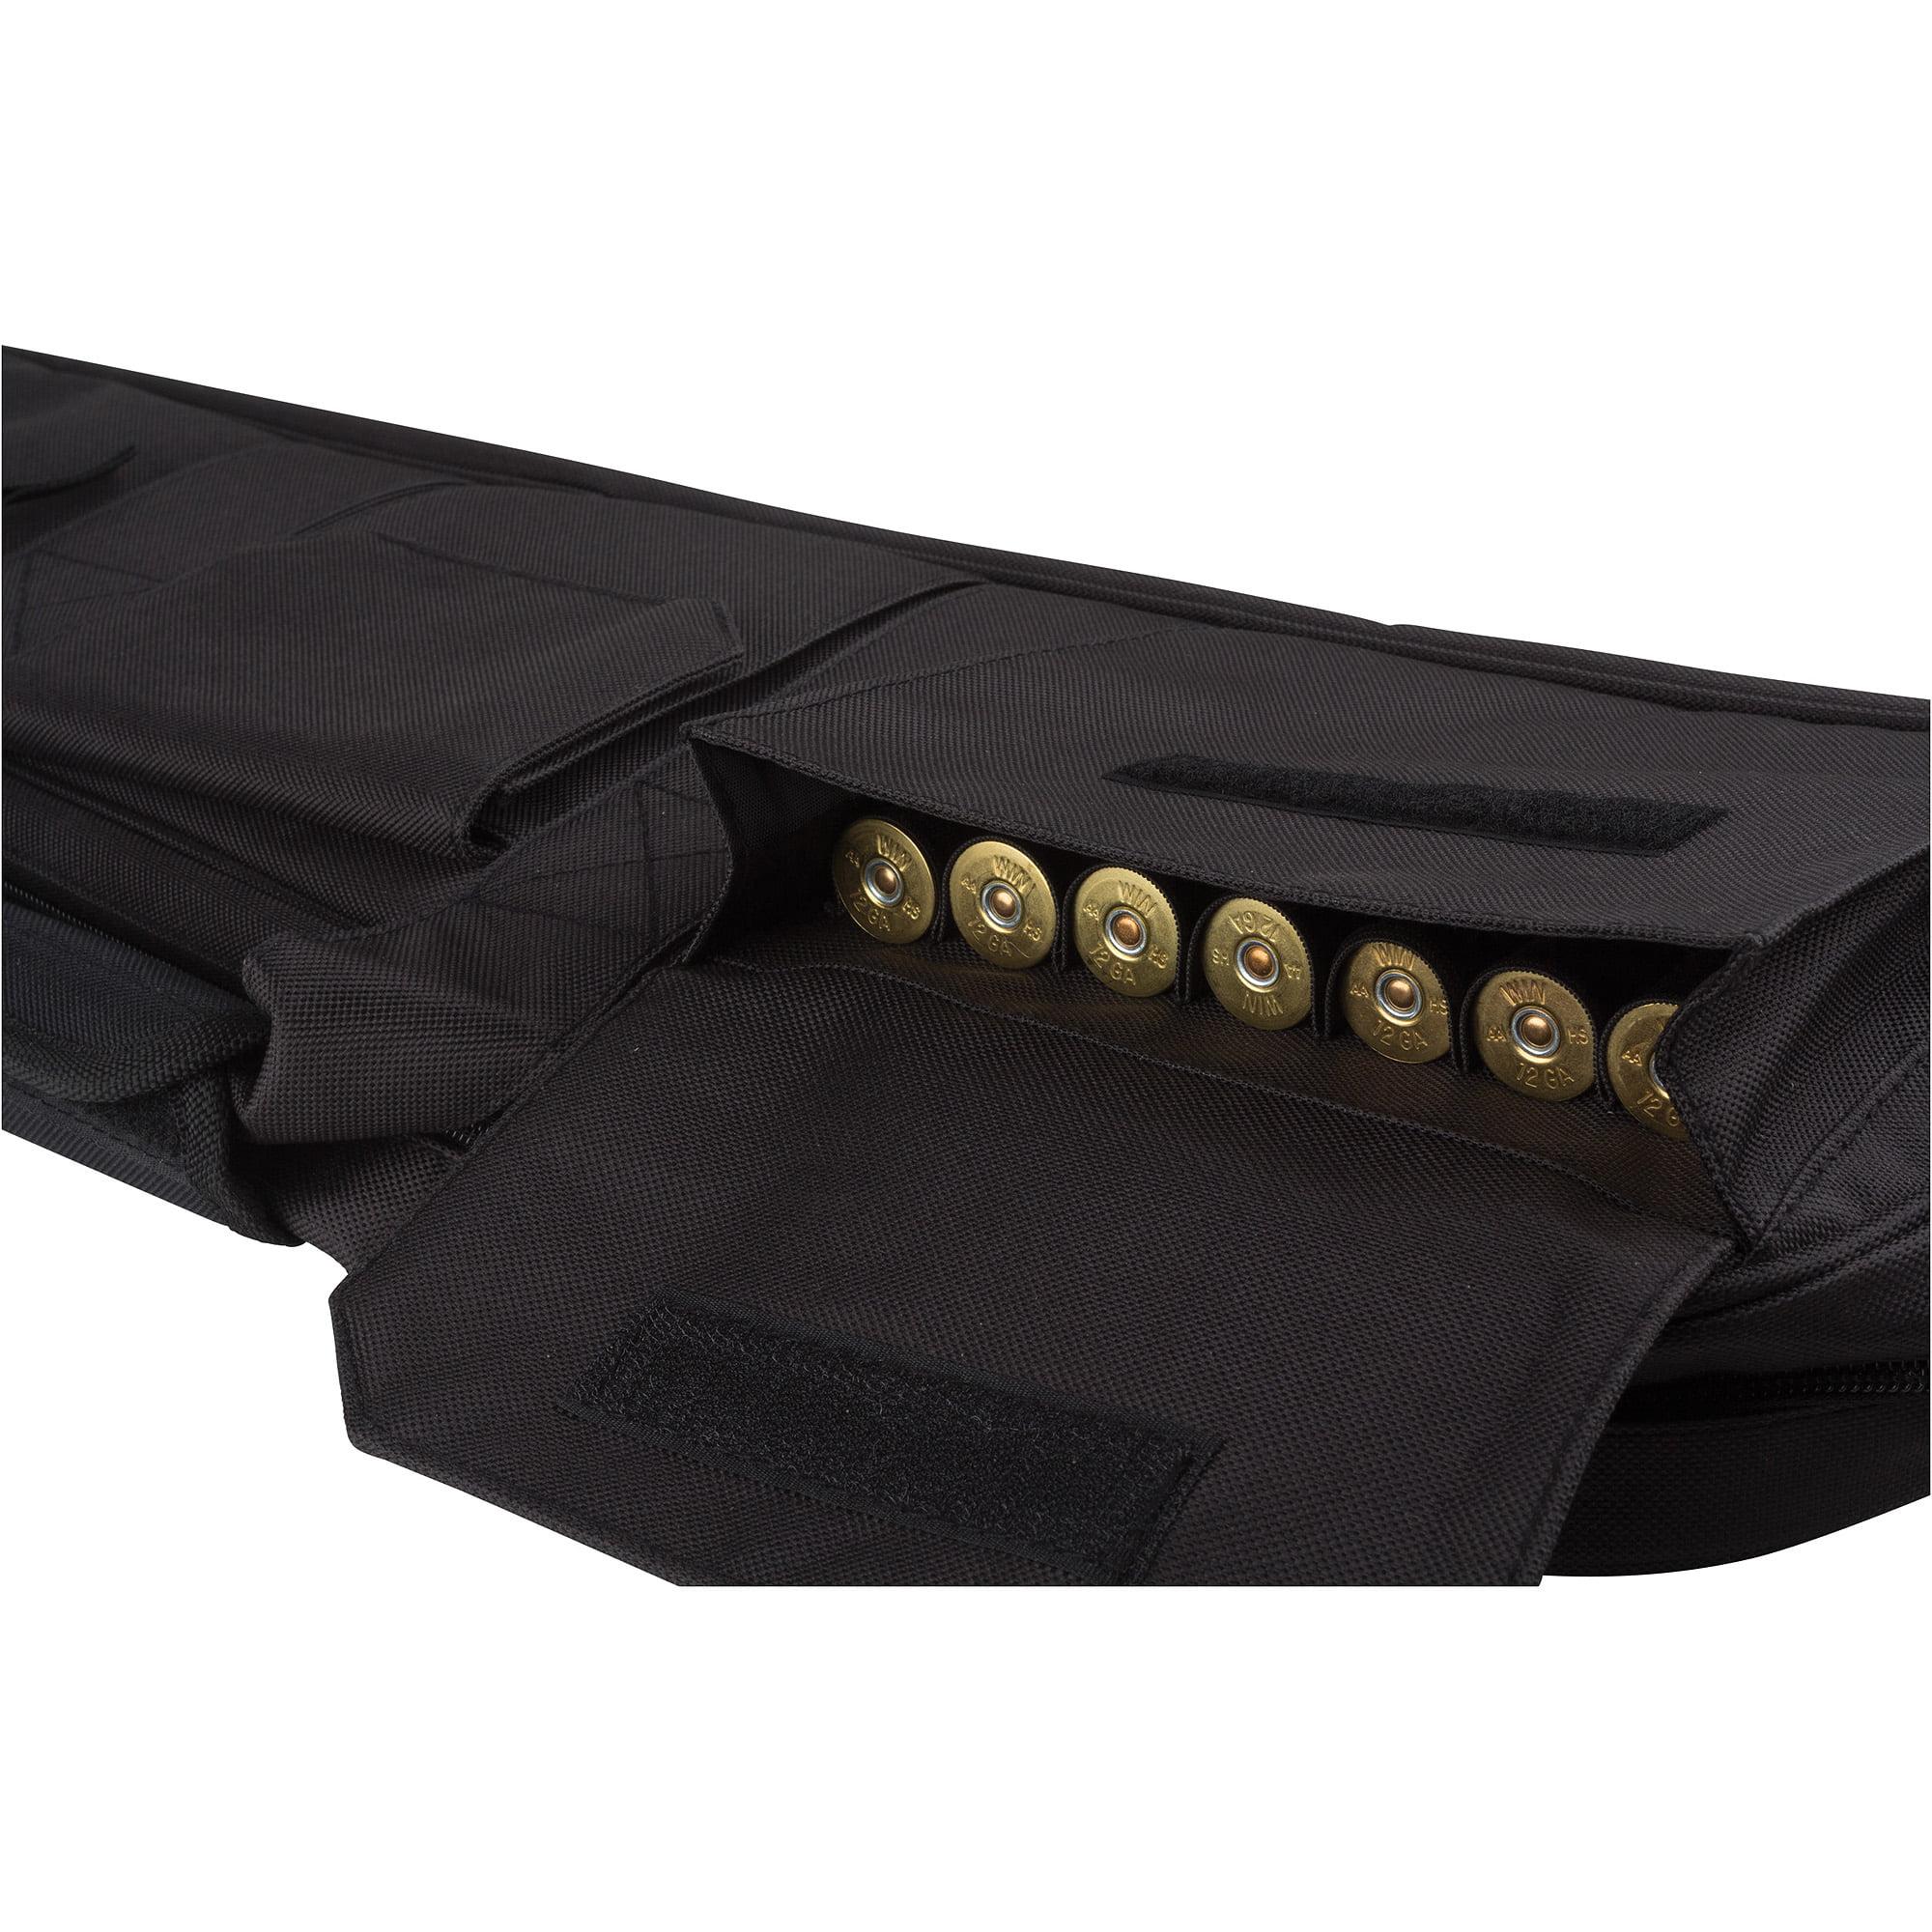 pistol grip shotgun case blk walmart com